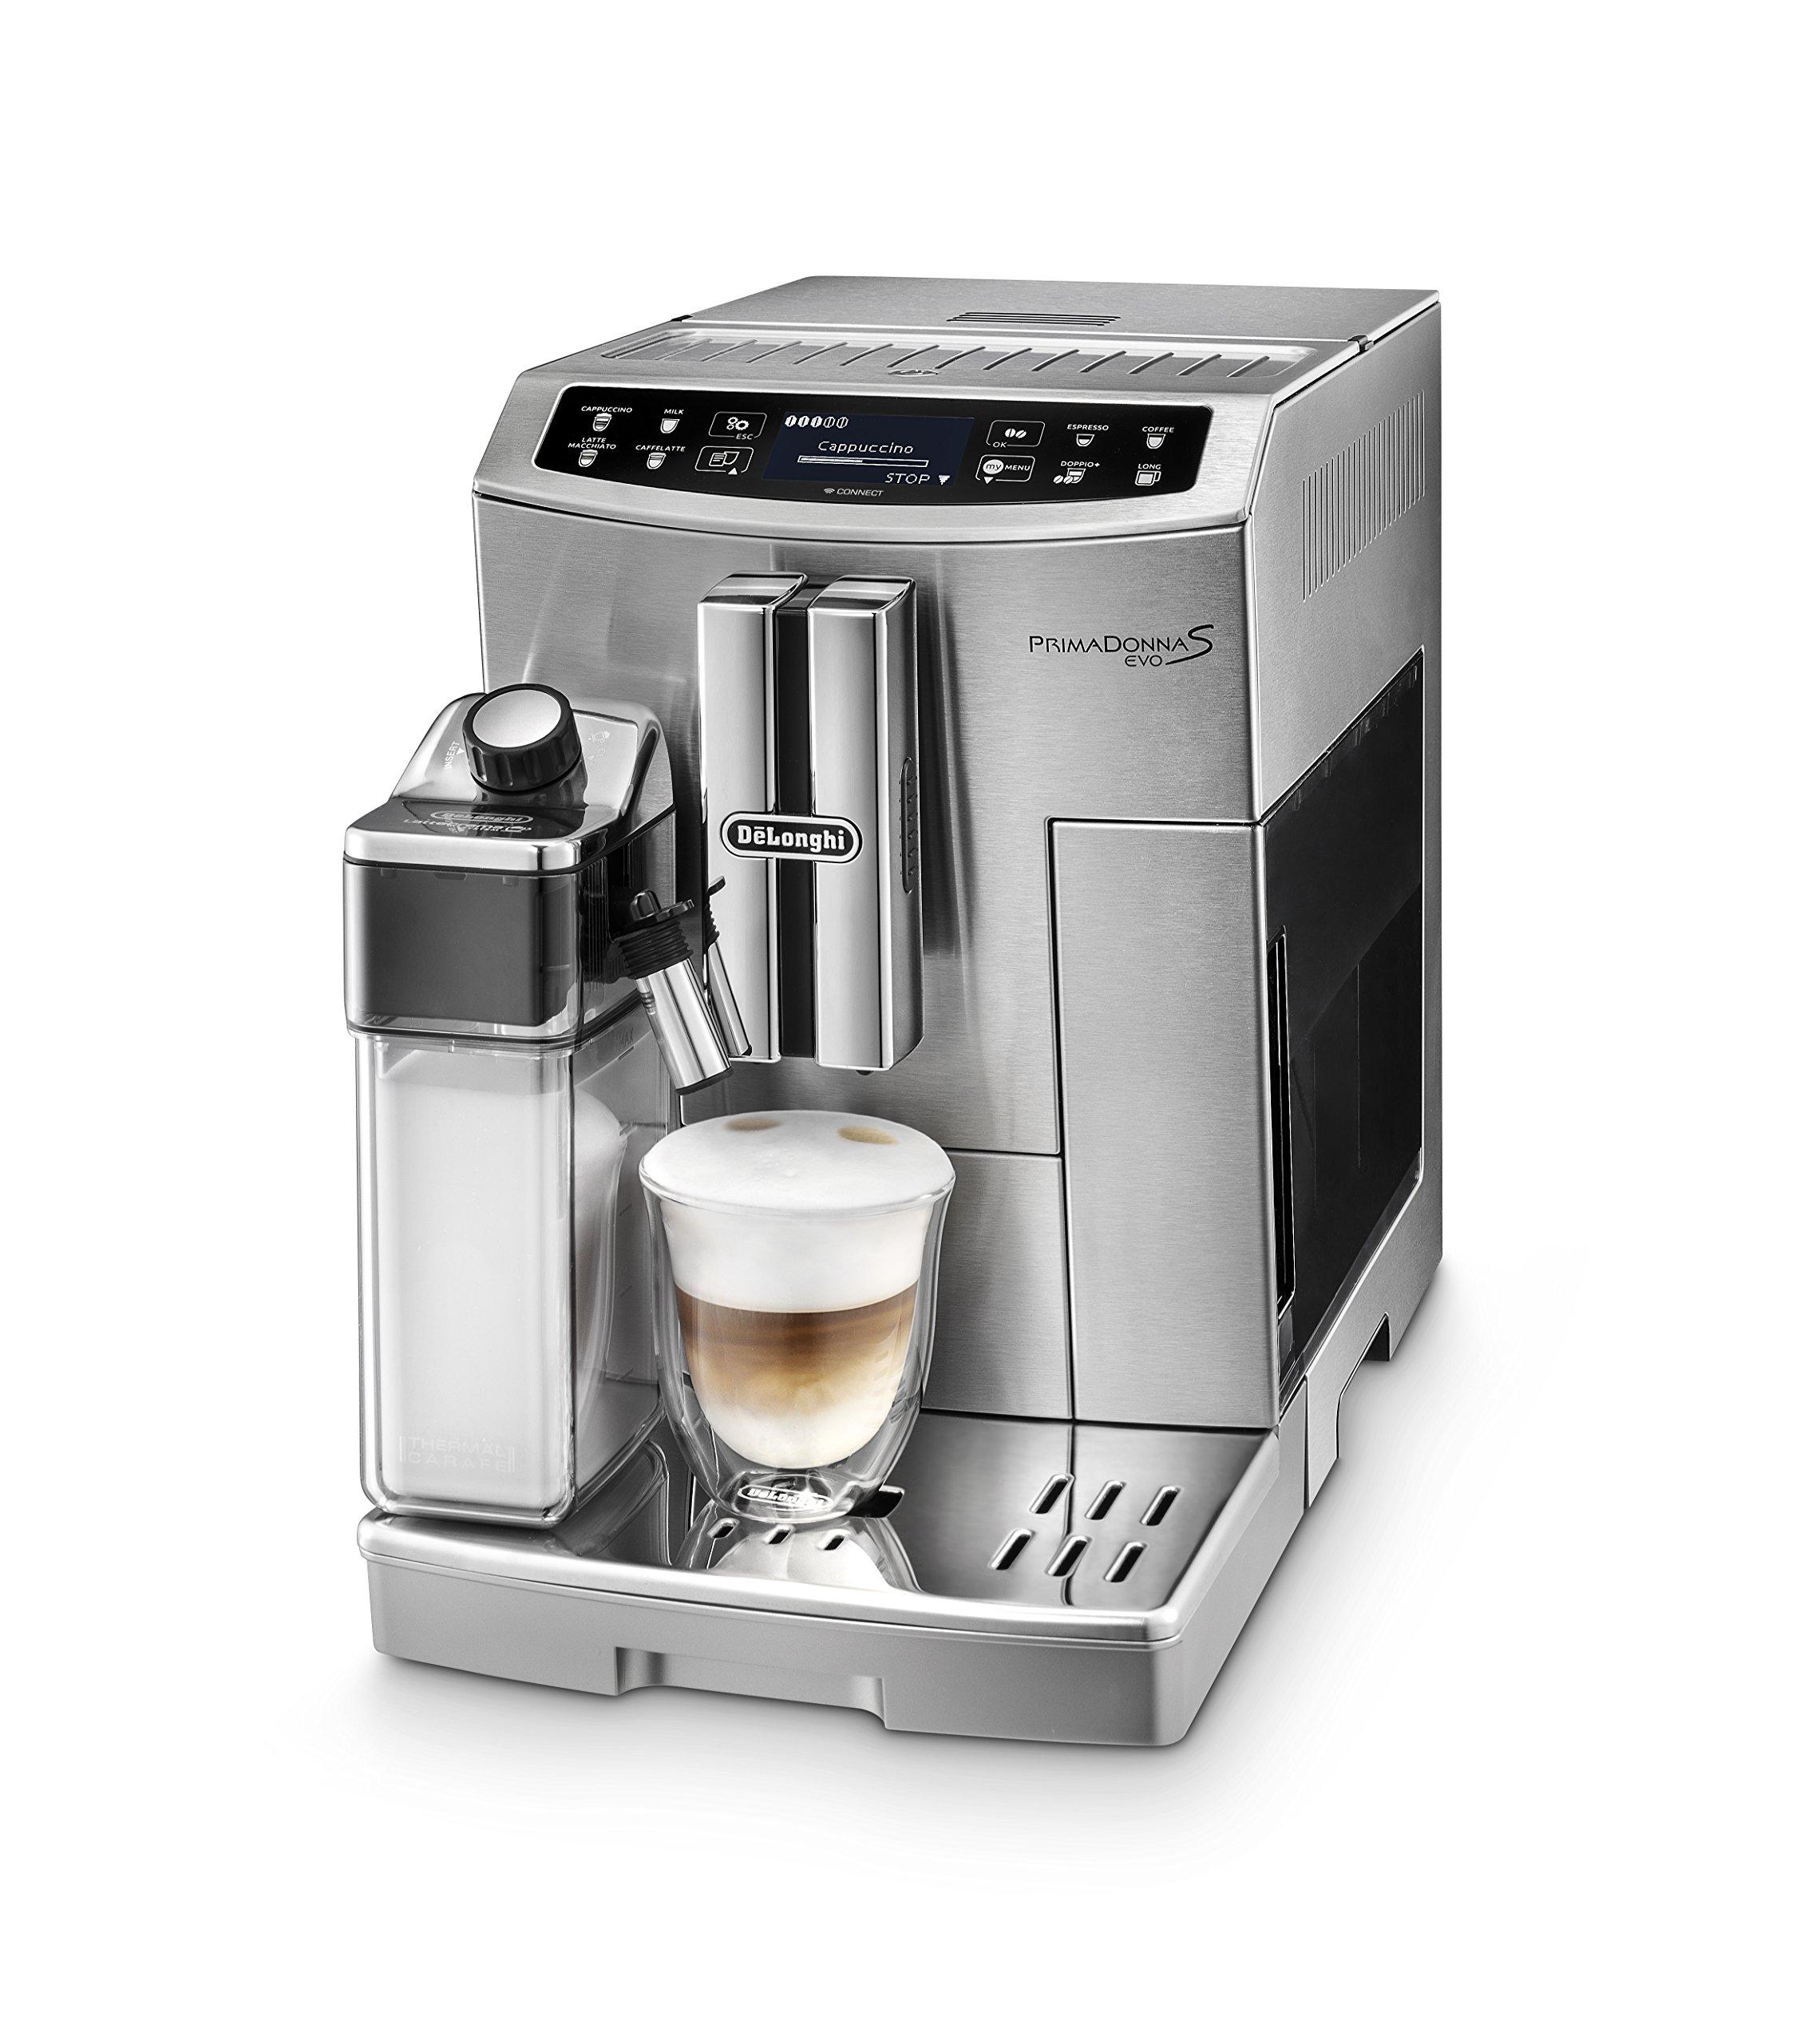 DeLonghi-PrimaDonna-S-Evo-ECAM-51055M-Kaffeevollautomat-1450-W-Digitaldisplay-integriertes-Milchsystem-APP-Steuerung-Edelstahlgehuse-Lieblingsgetrnke-auf-Knopdfruck-silber